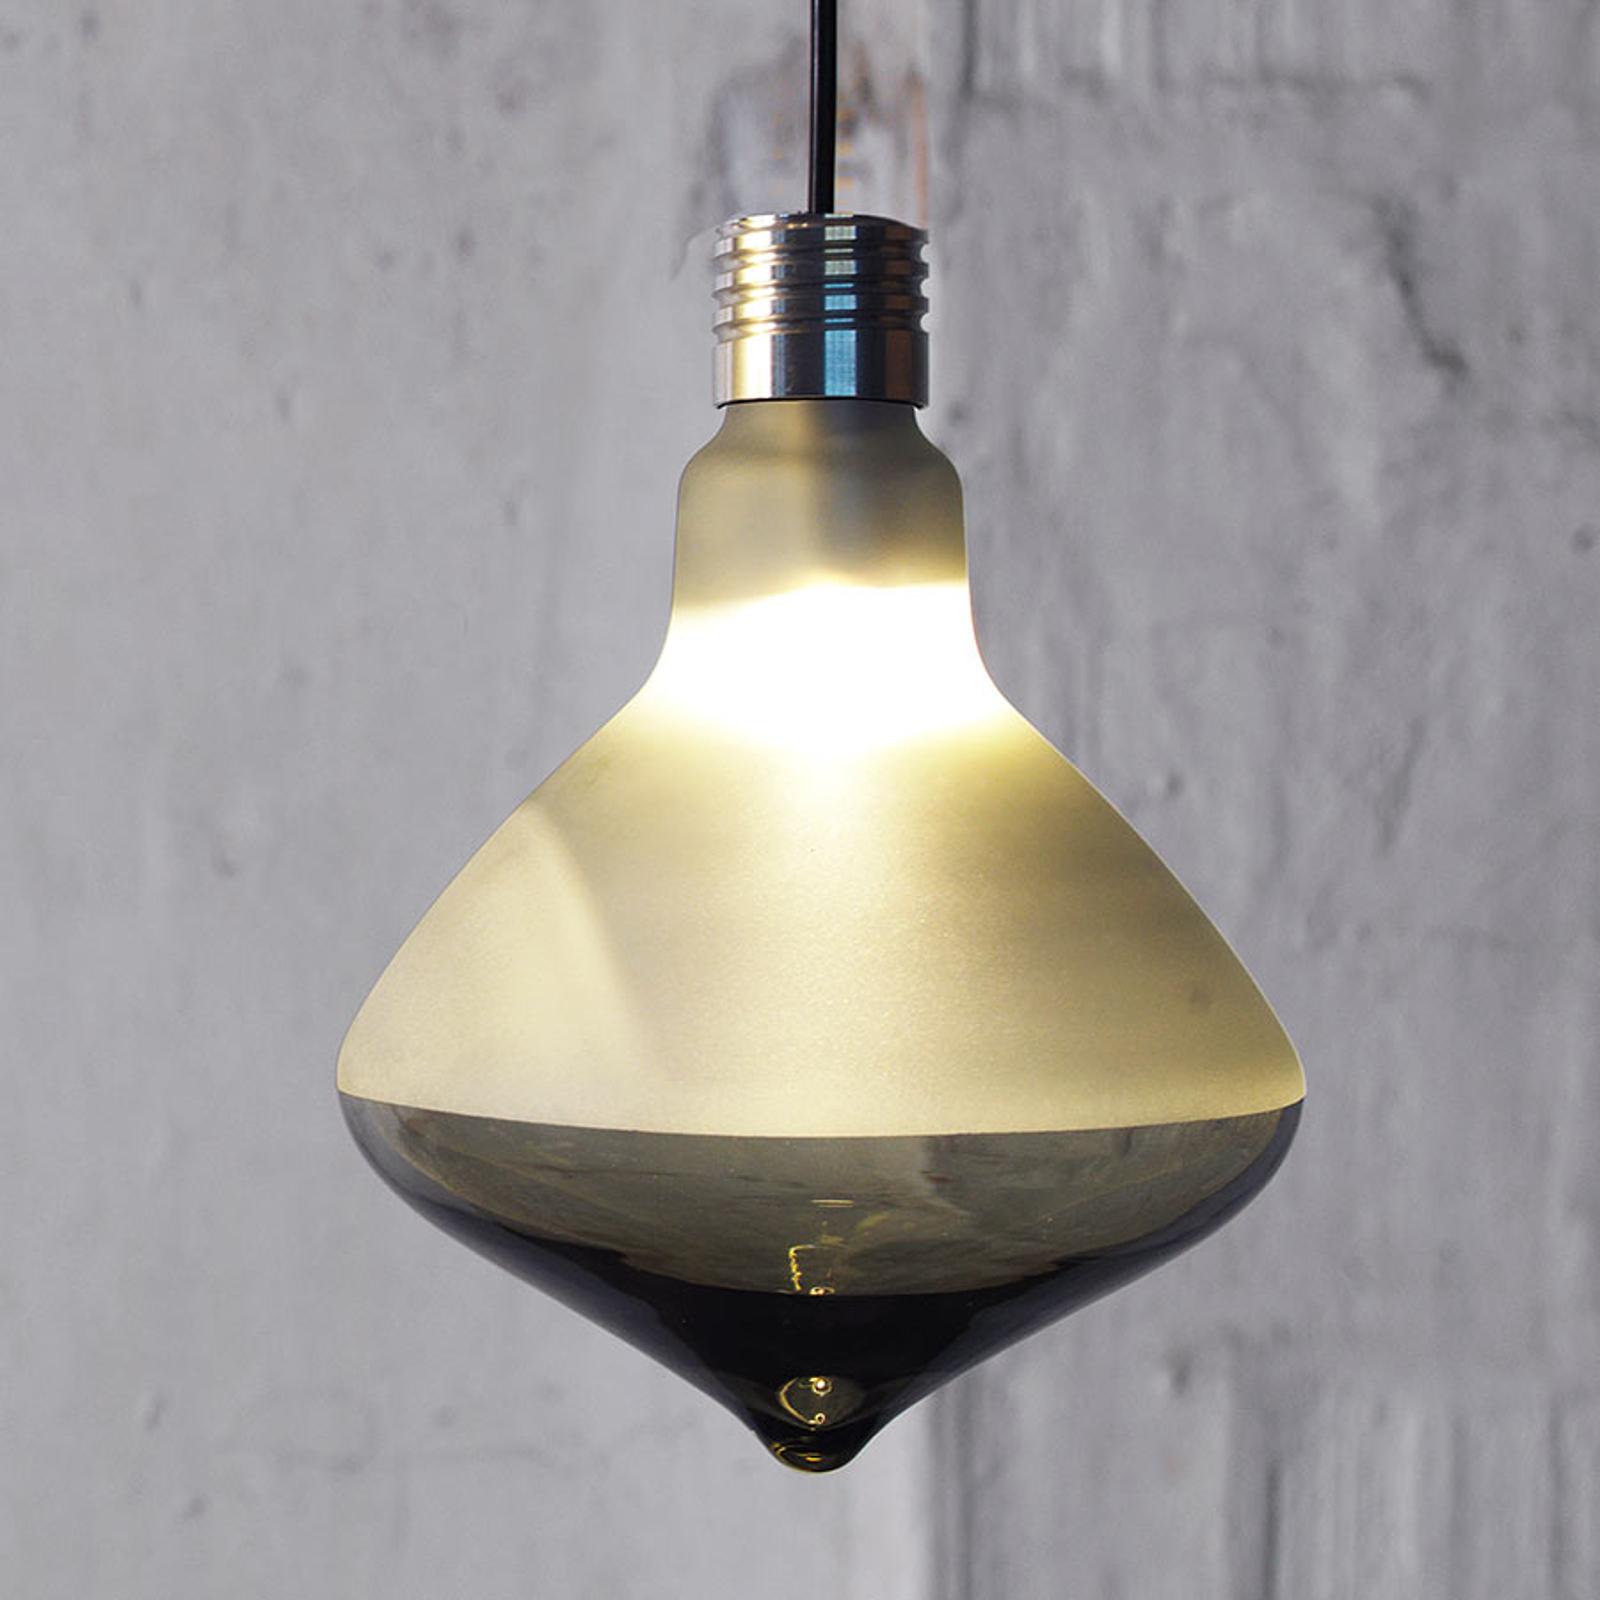 Karman Makeup - lampa wisząca LED, szpiczasta